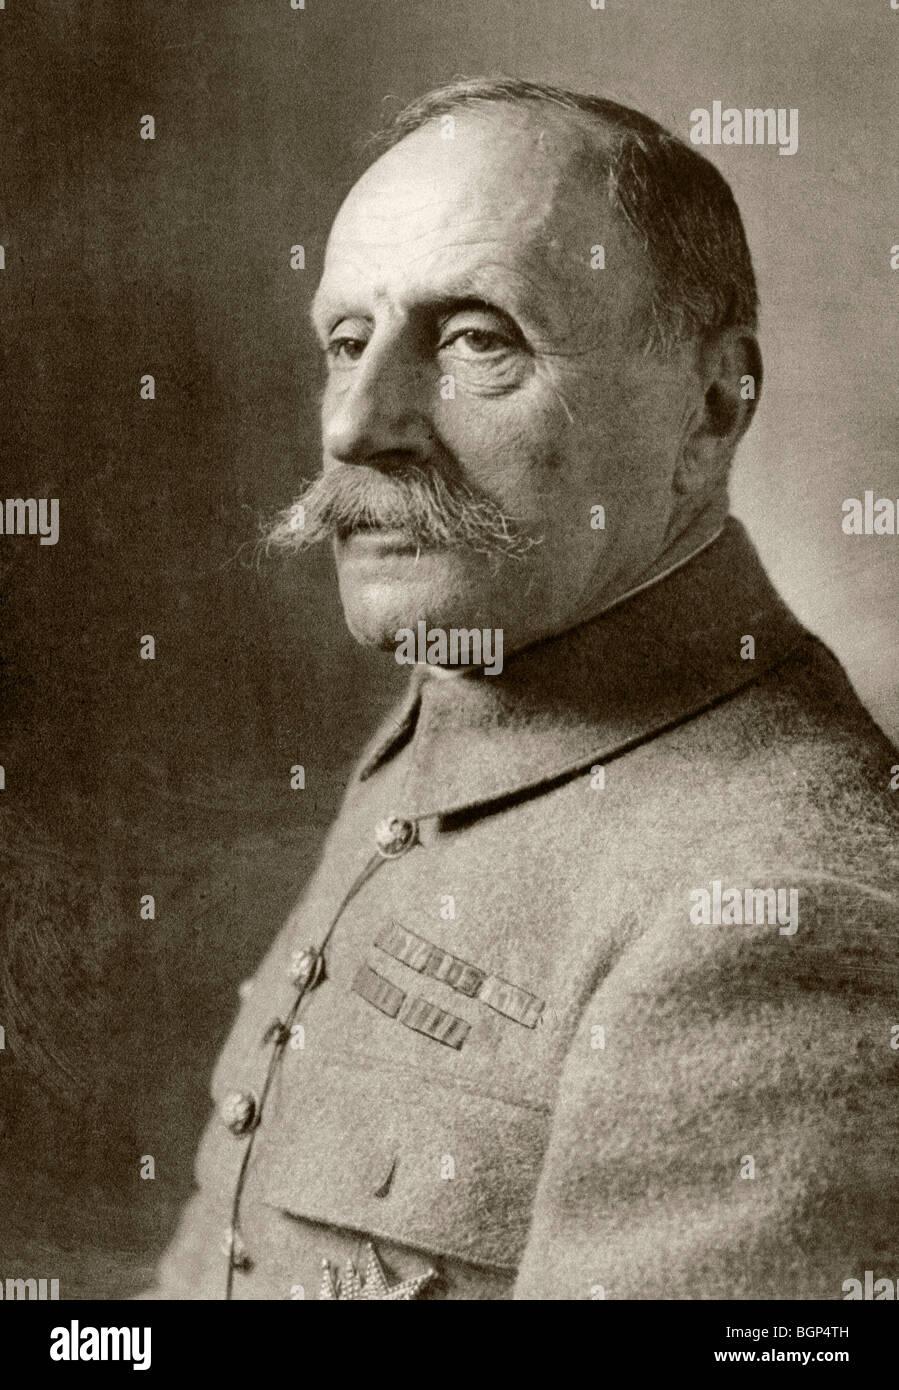 Marshal of France Ferdinand Foch 1851 to 1929. - Stock Image